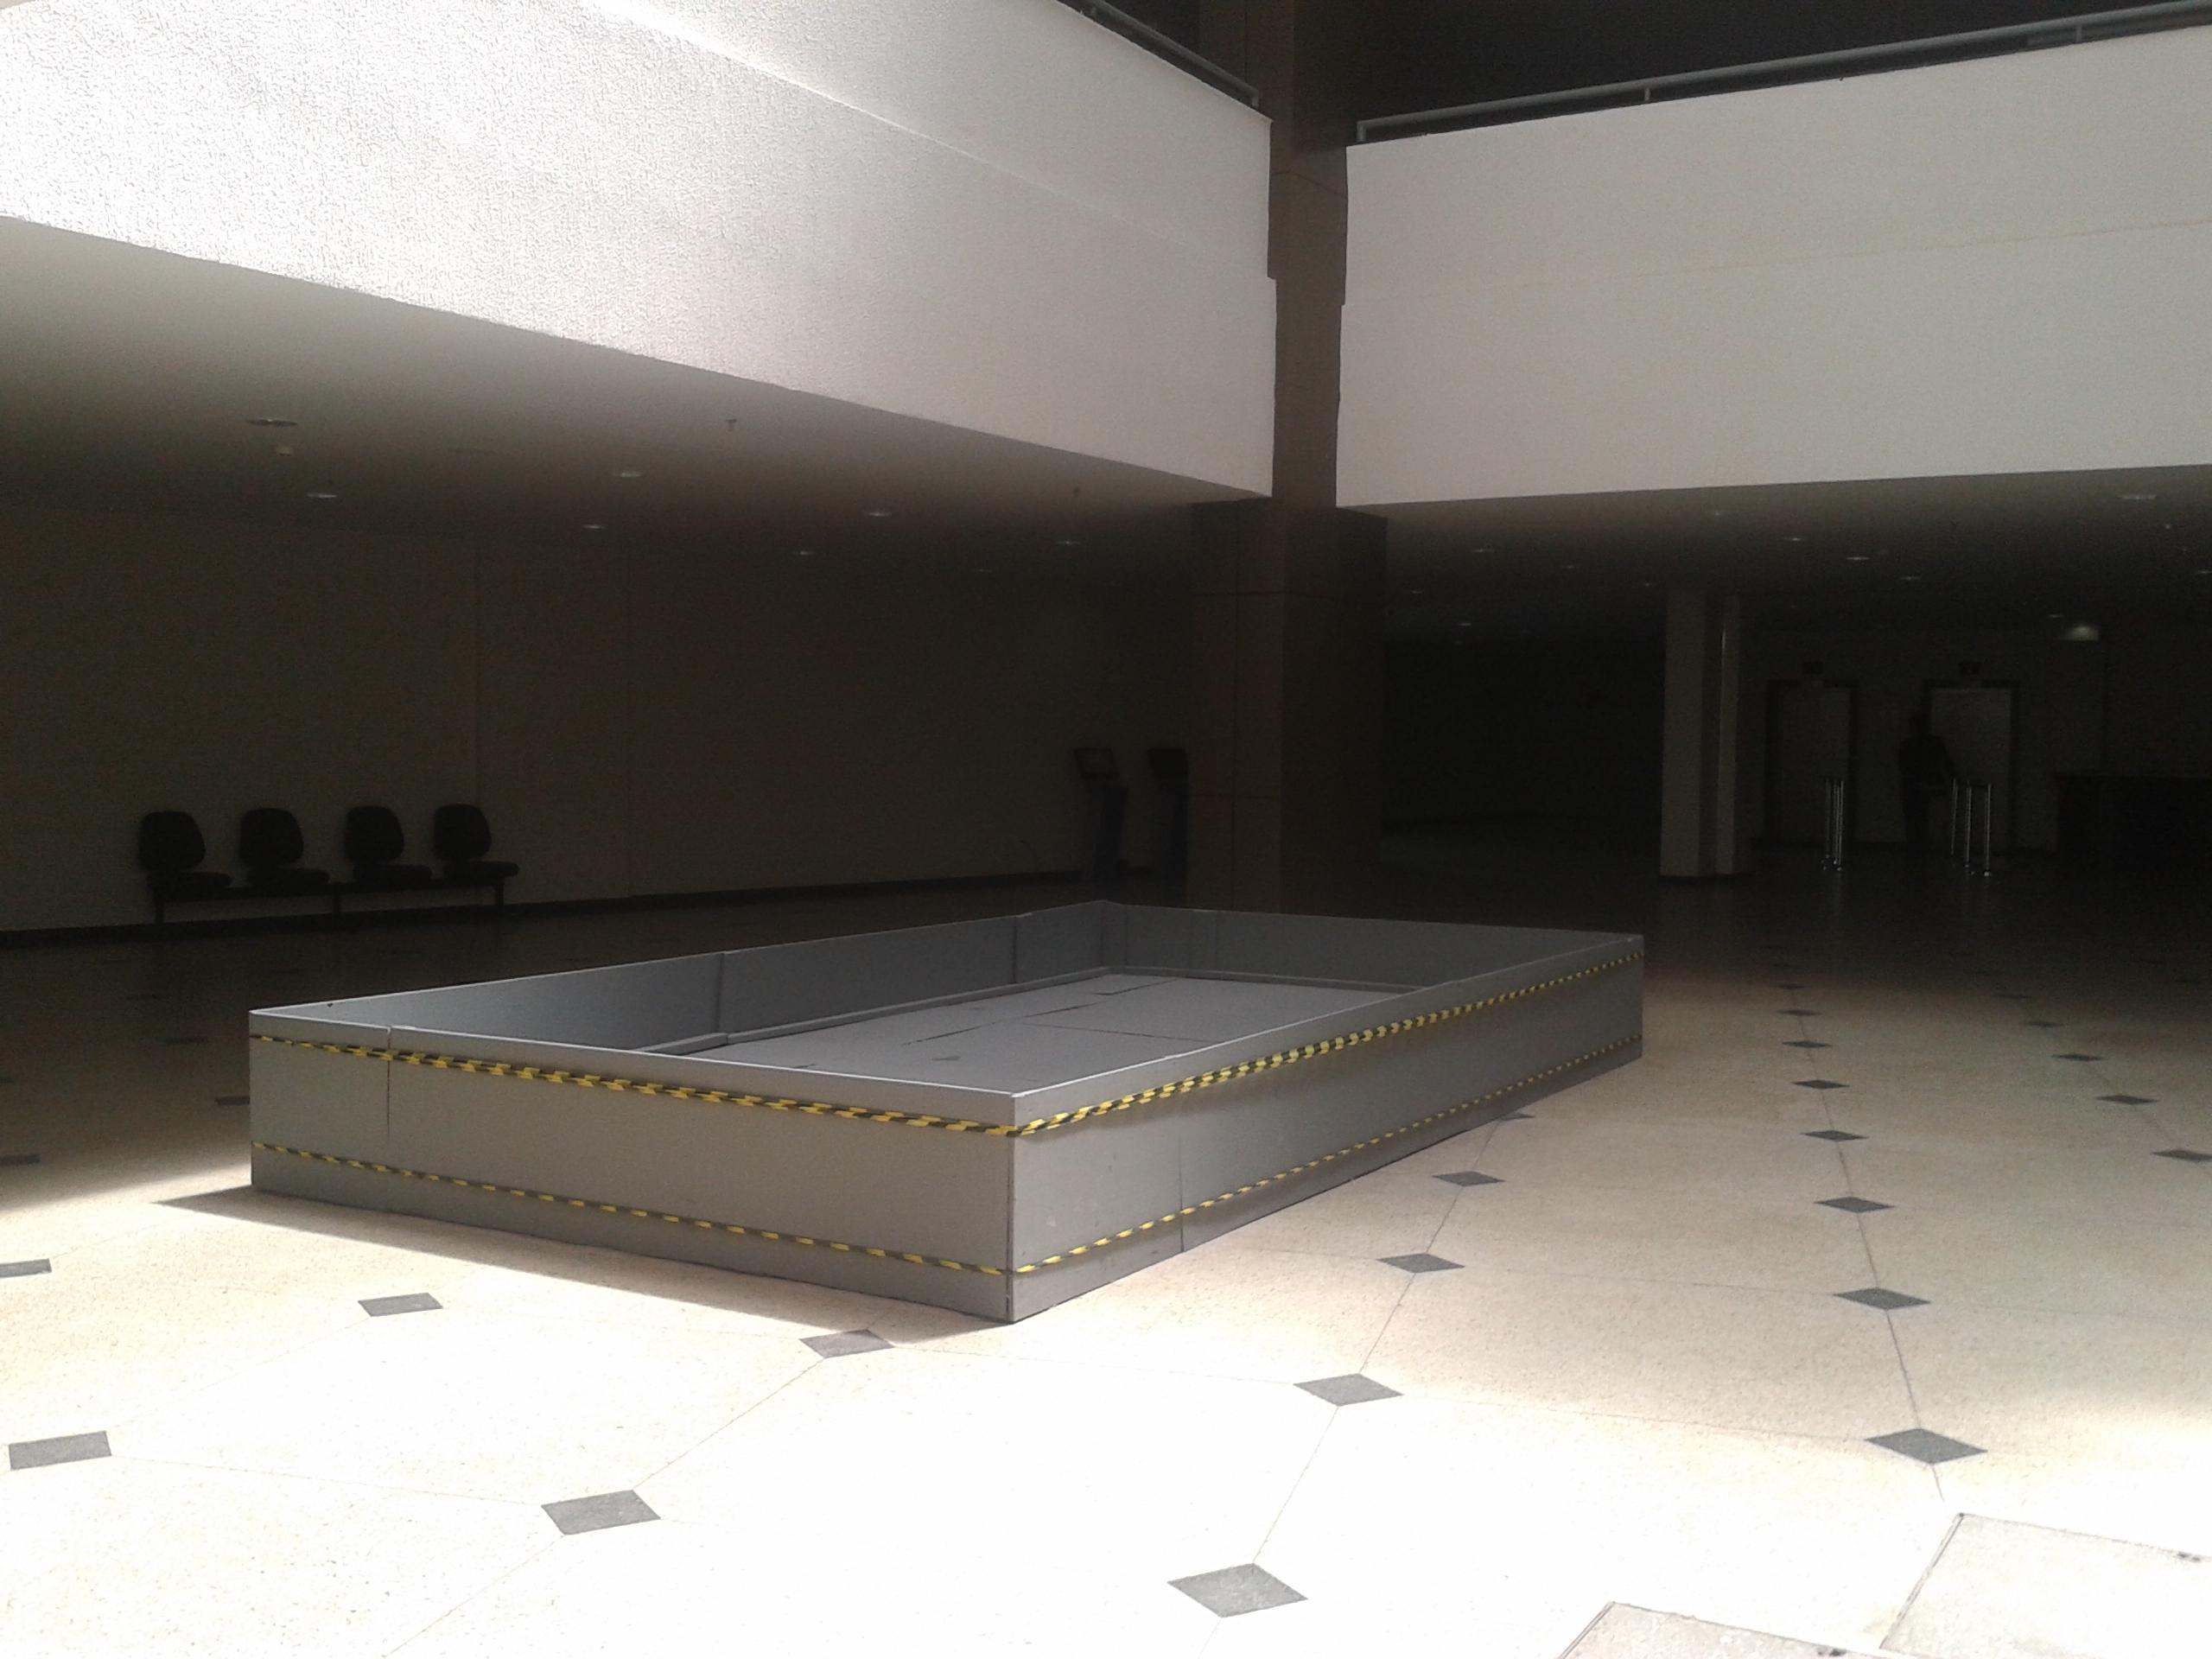 obra-elevadores-panoramicos-forum-sao-luis